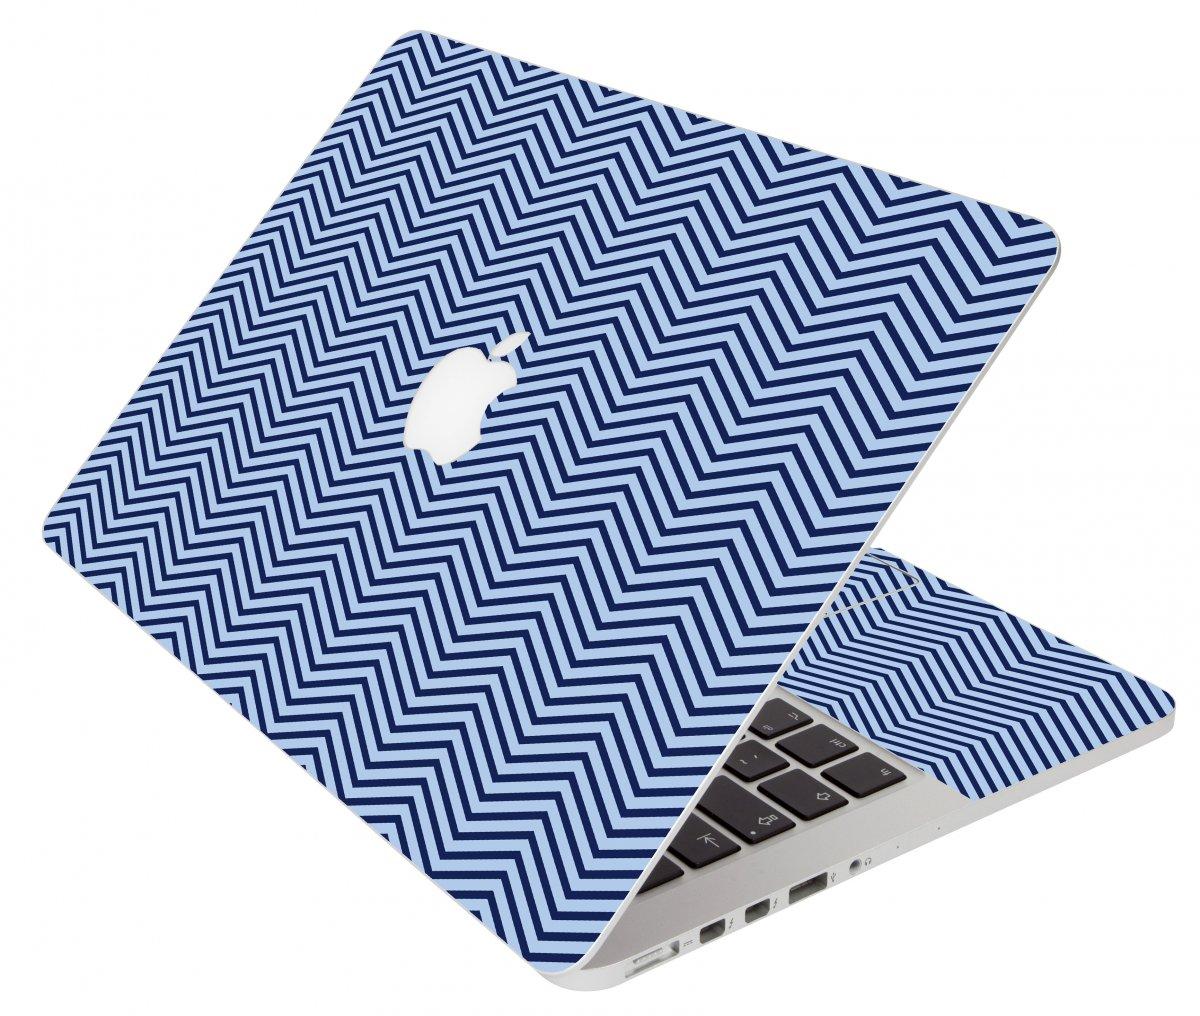 Blue On Blue Chevron Apple Macbook Pro 15 A1286 Laptop Skin